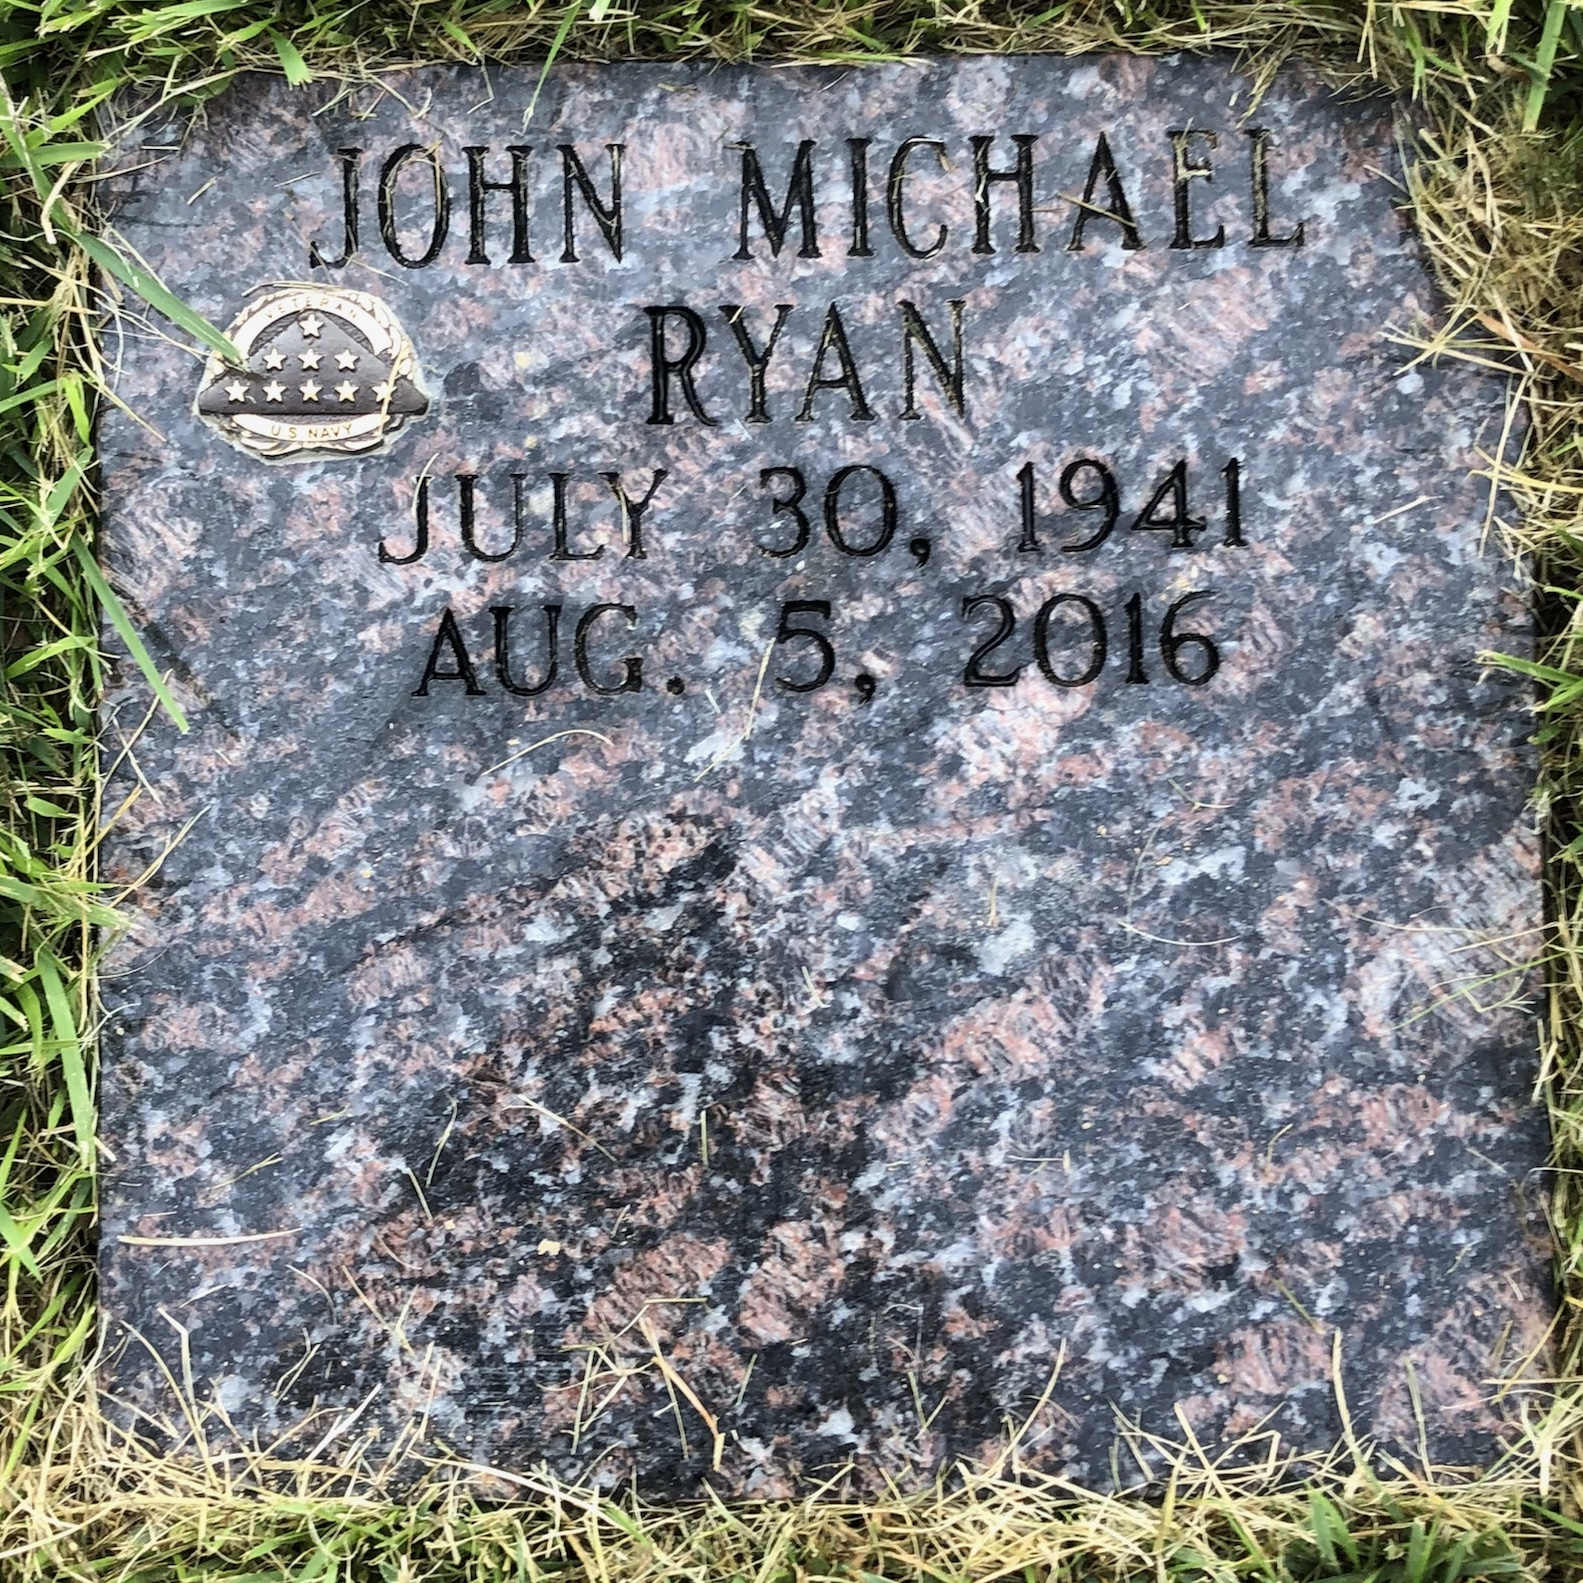 JohnRyan